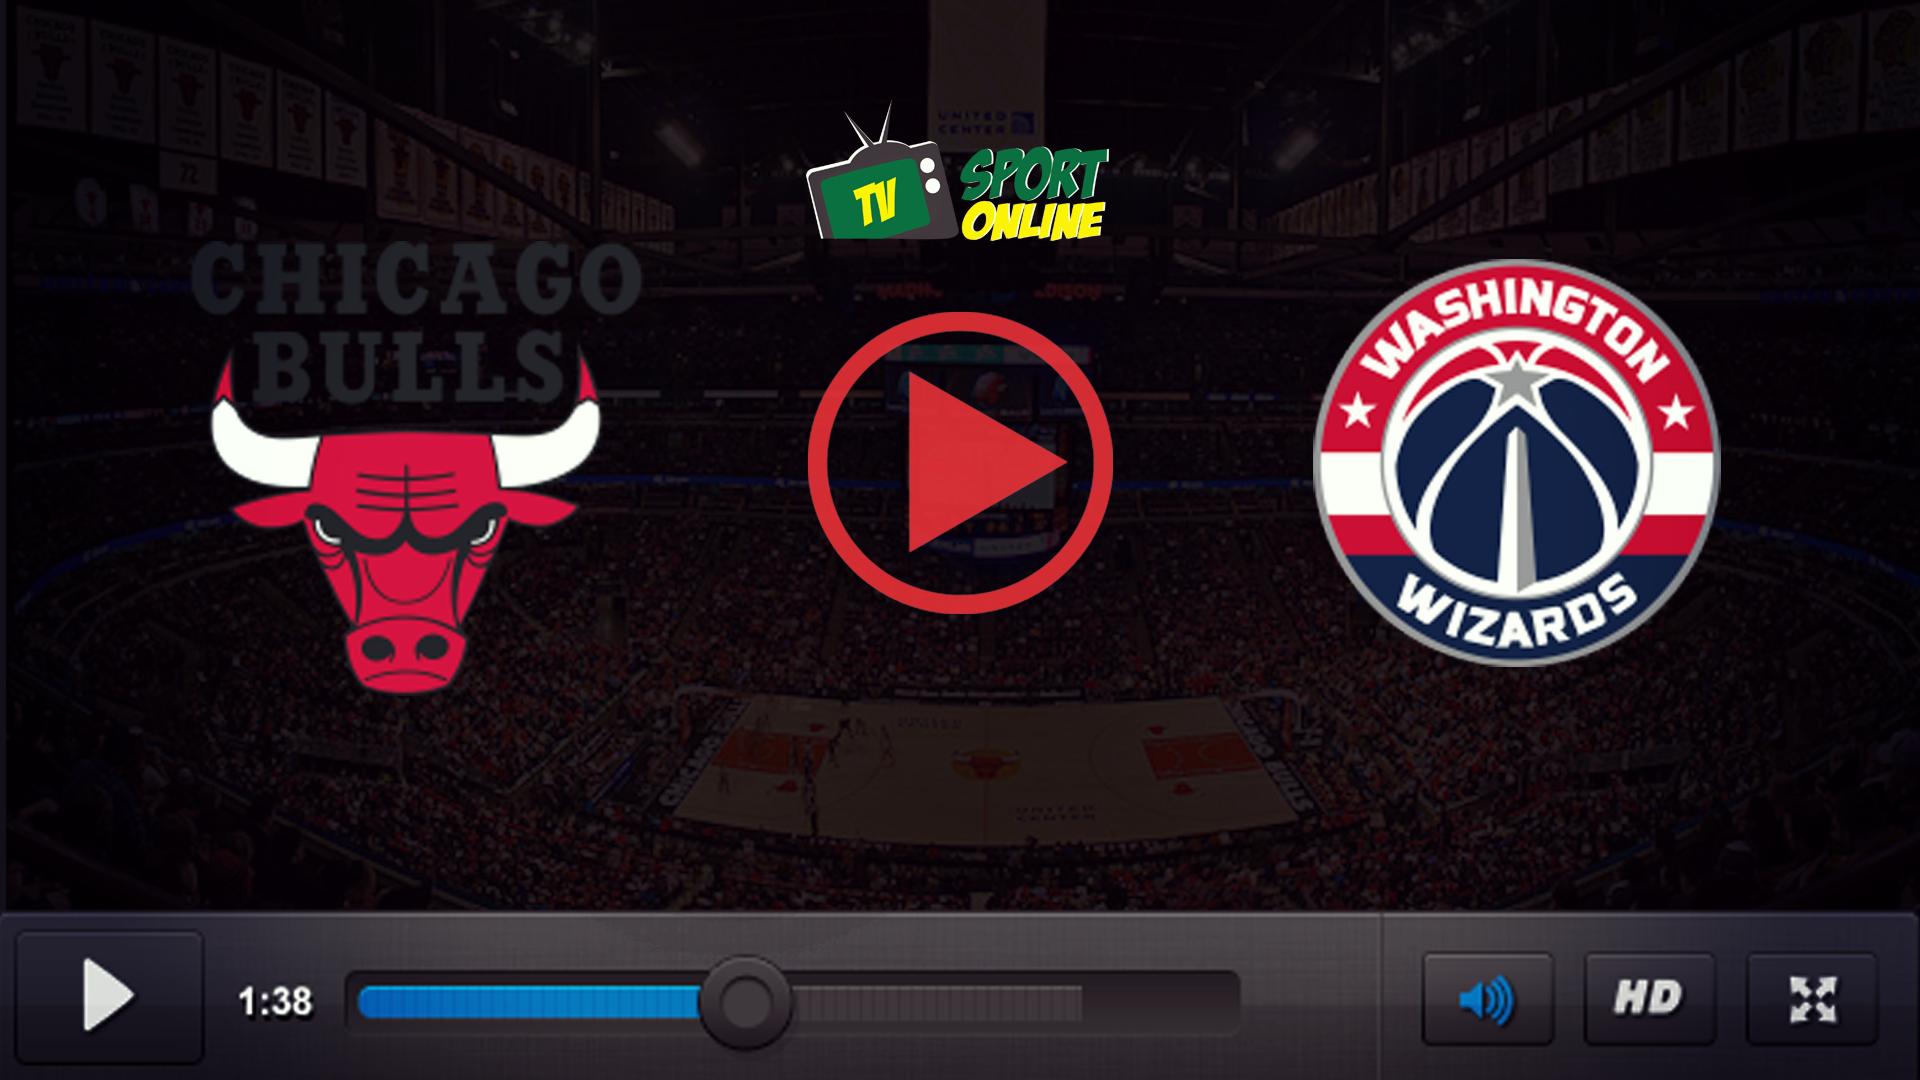 Watch Live Stream Chicago Bulls – Washington Wizards